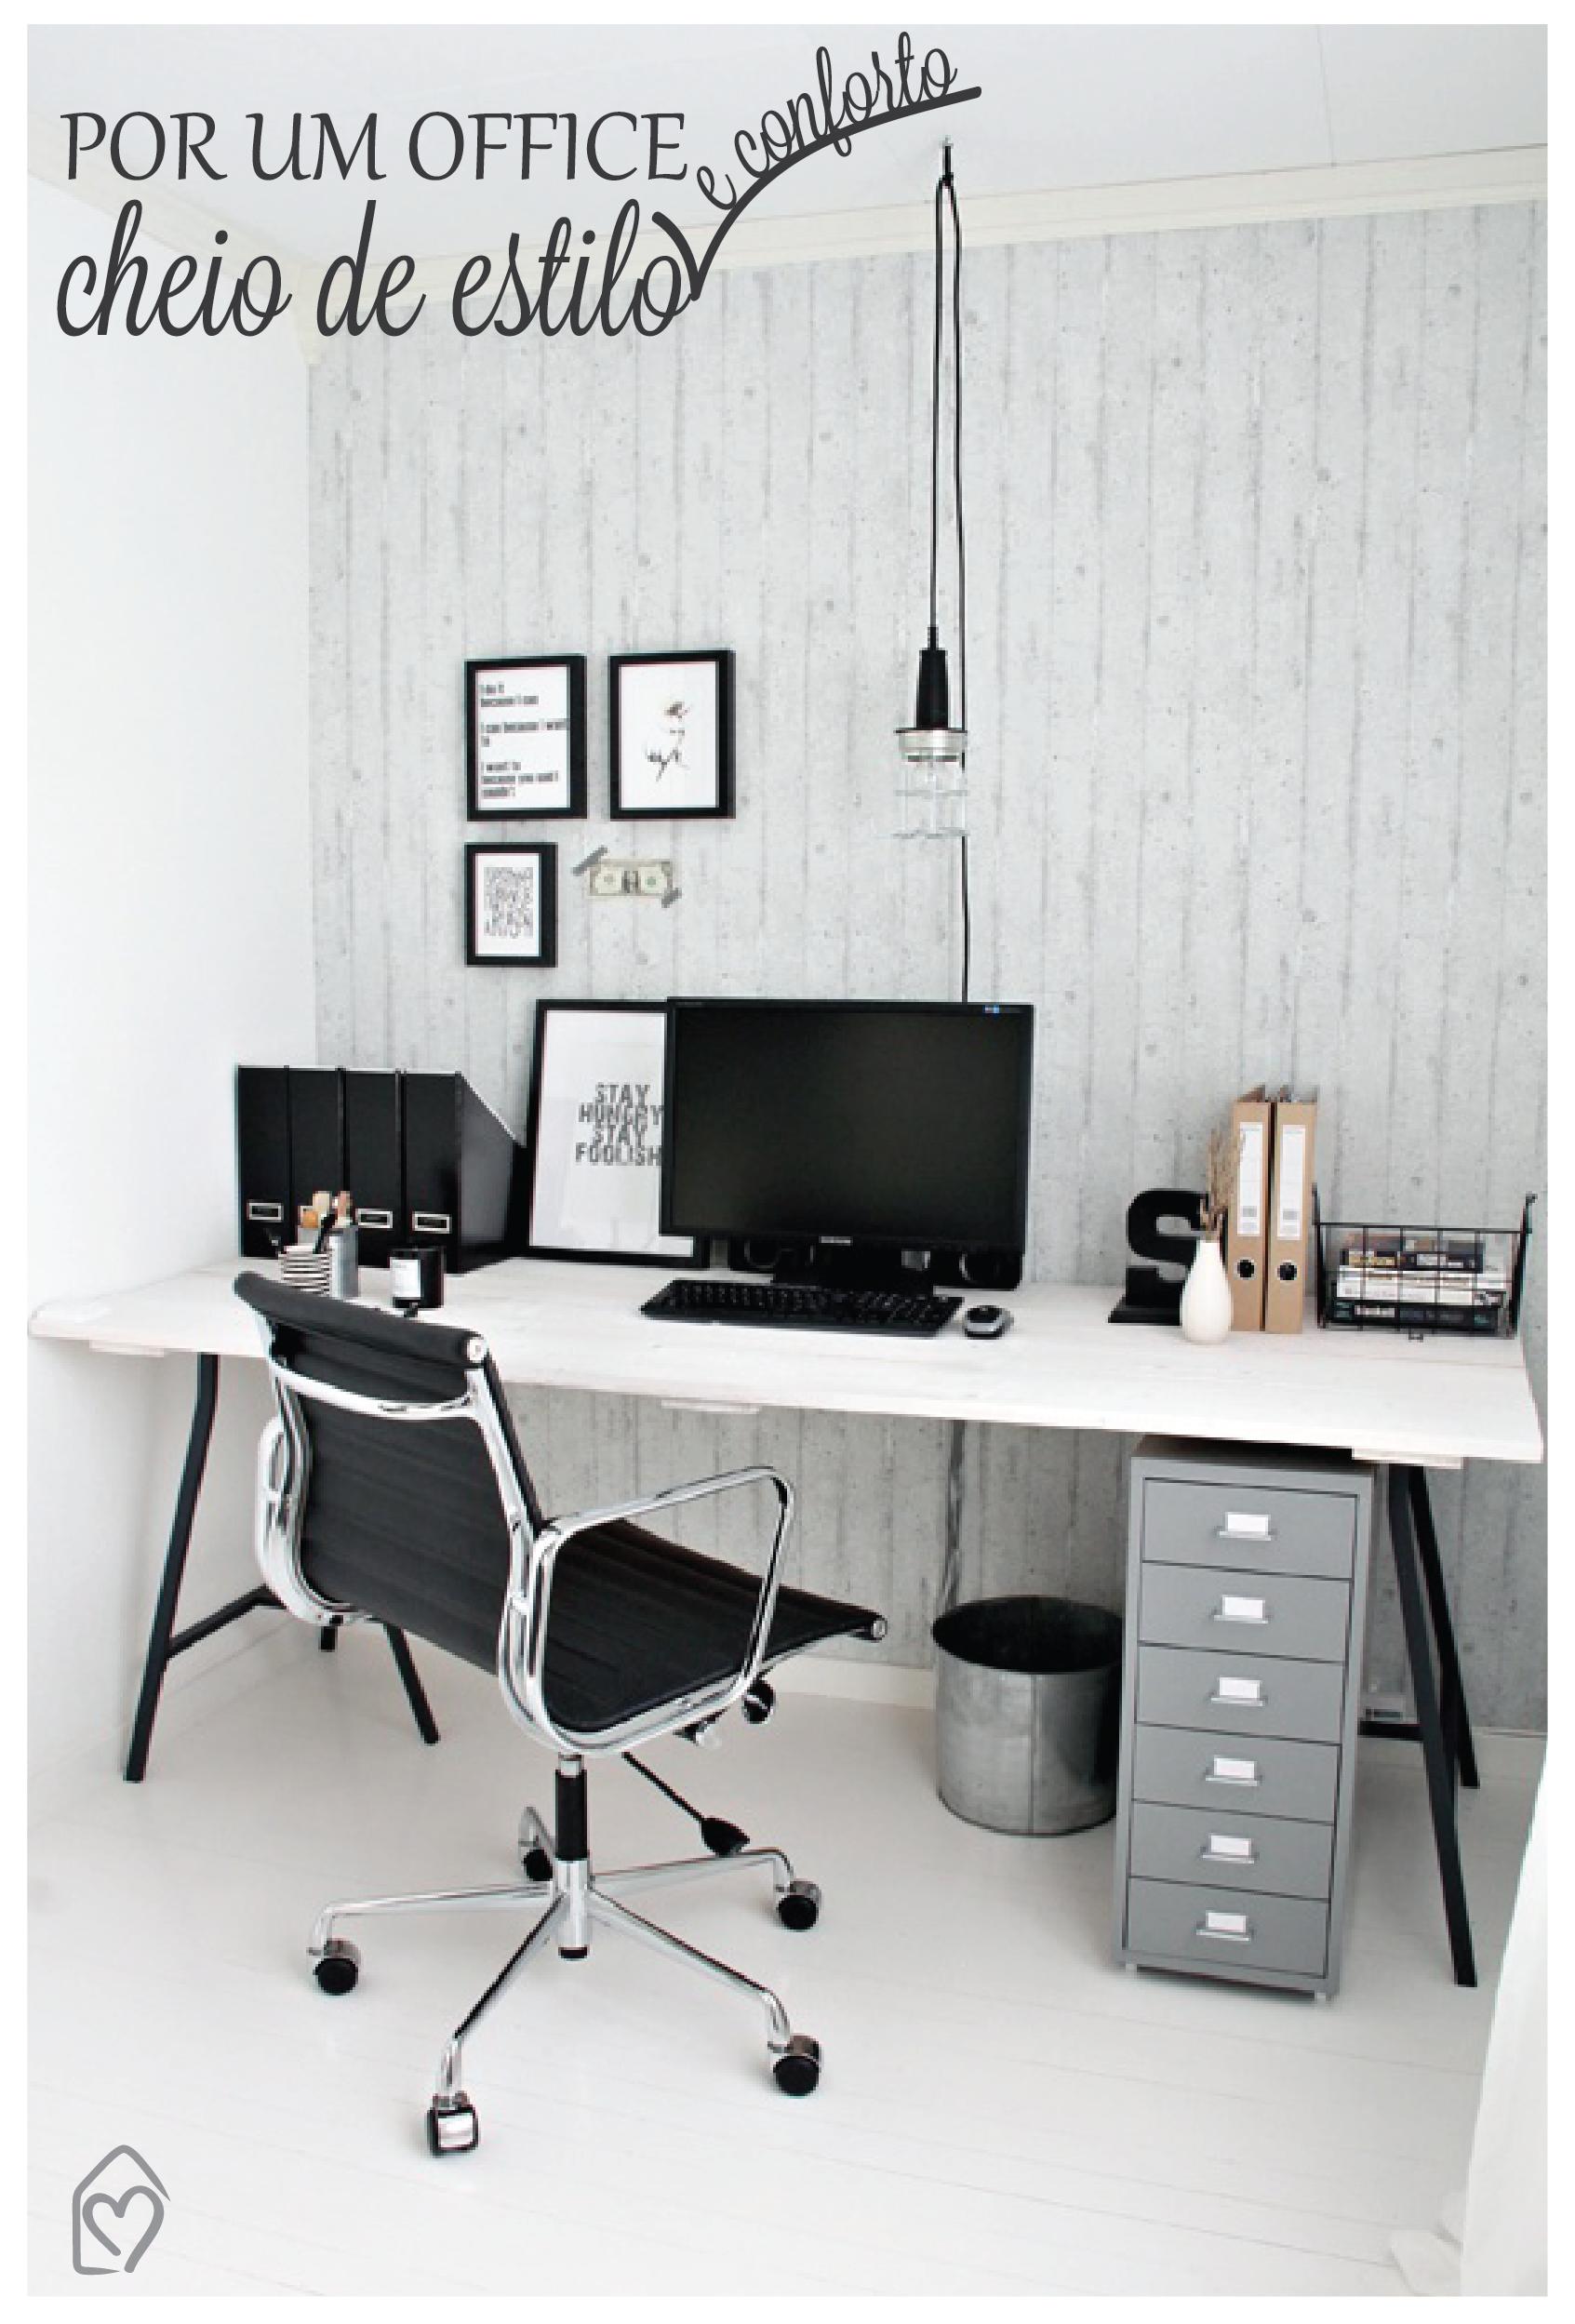 office_modernidade-01